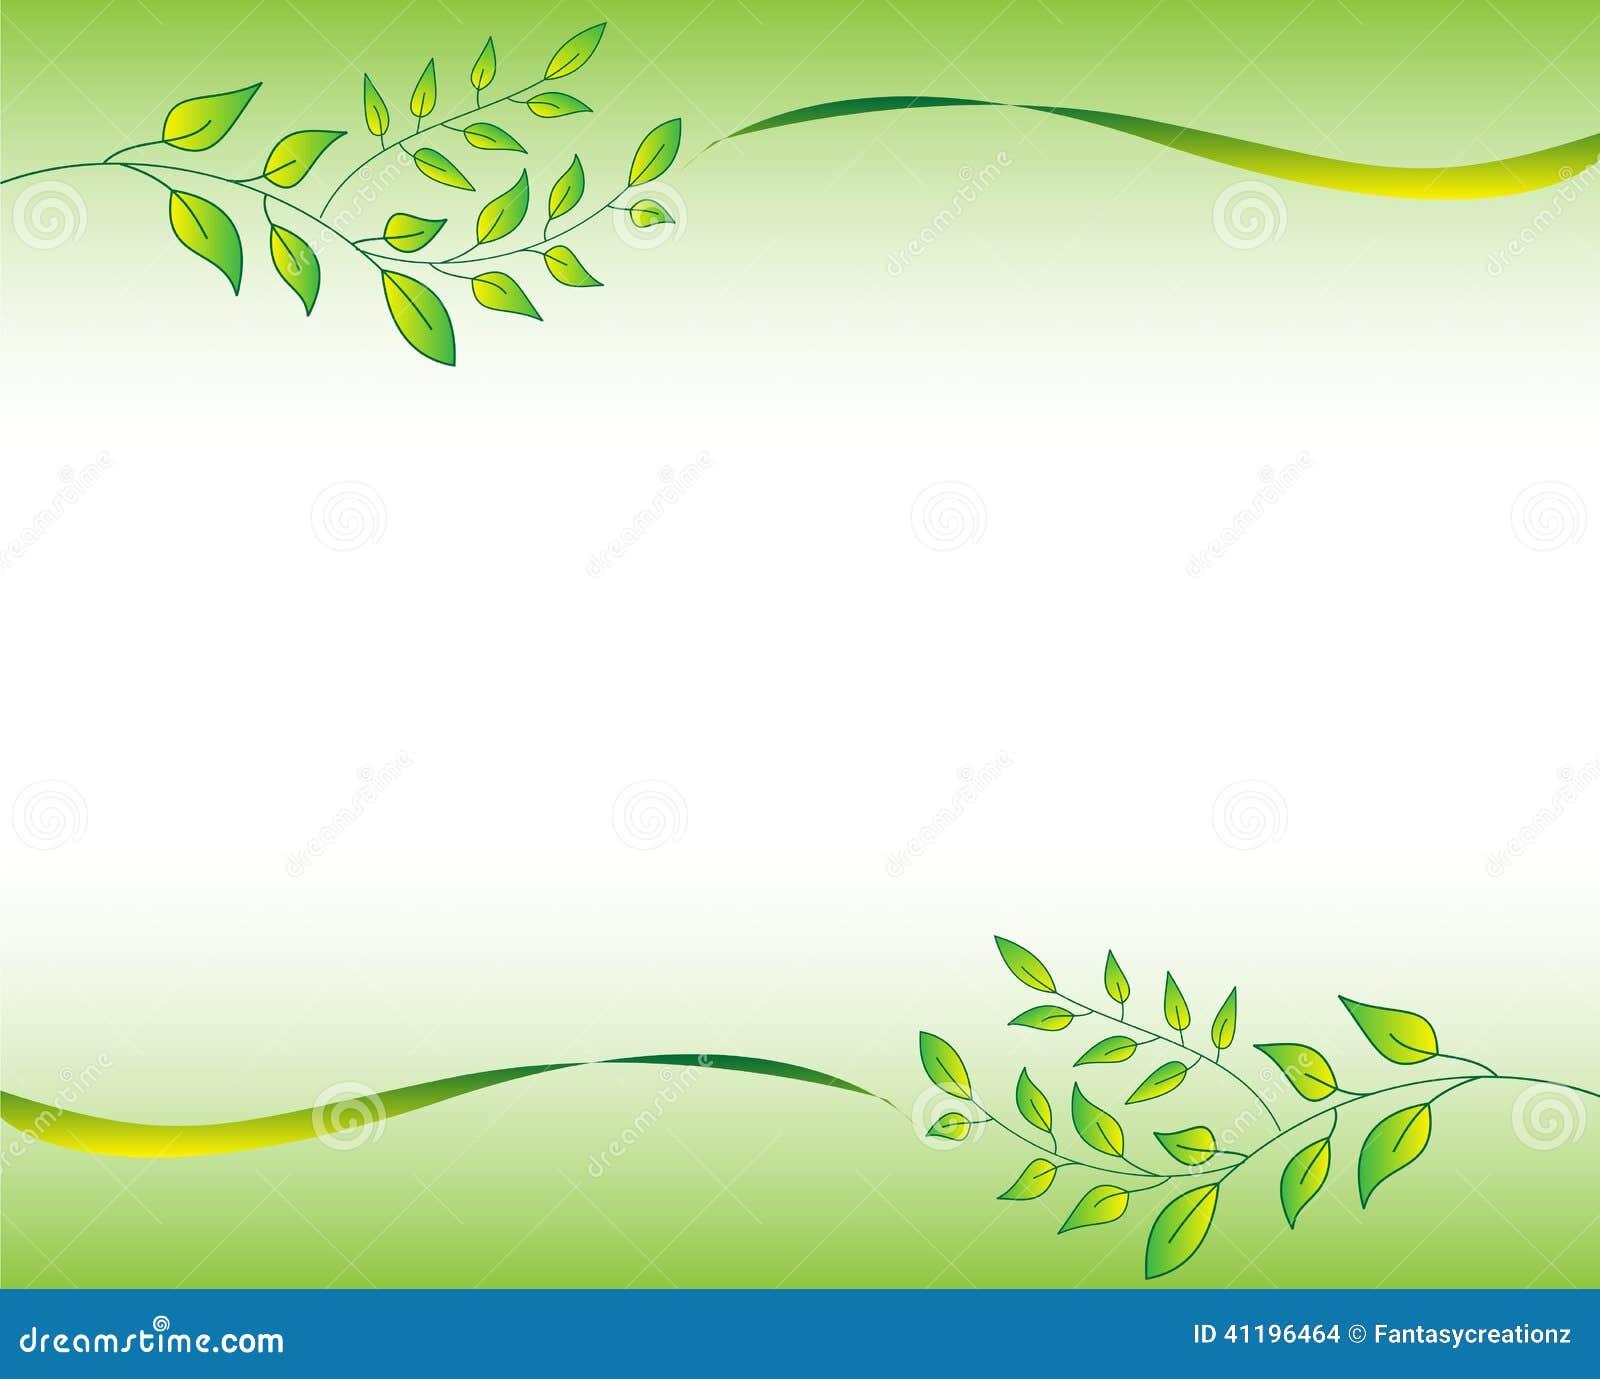 A Frame House Plan Green Leaf Border Stock Vector Image 41196464